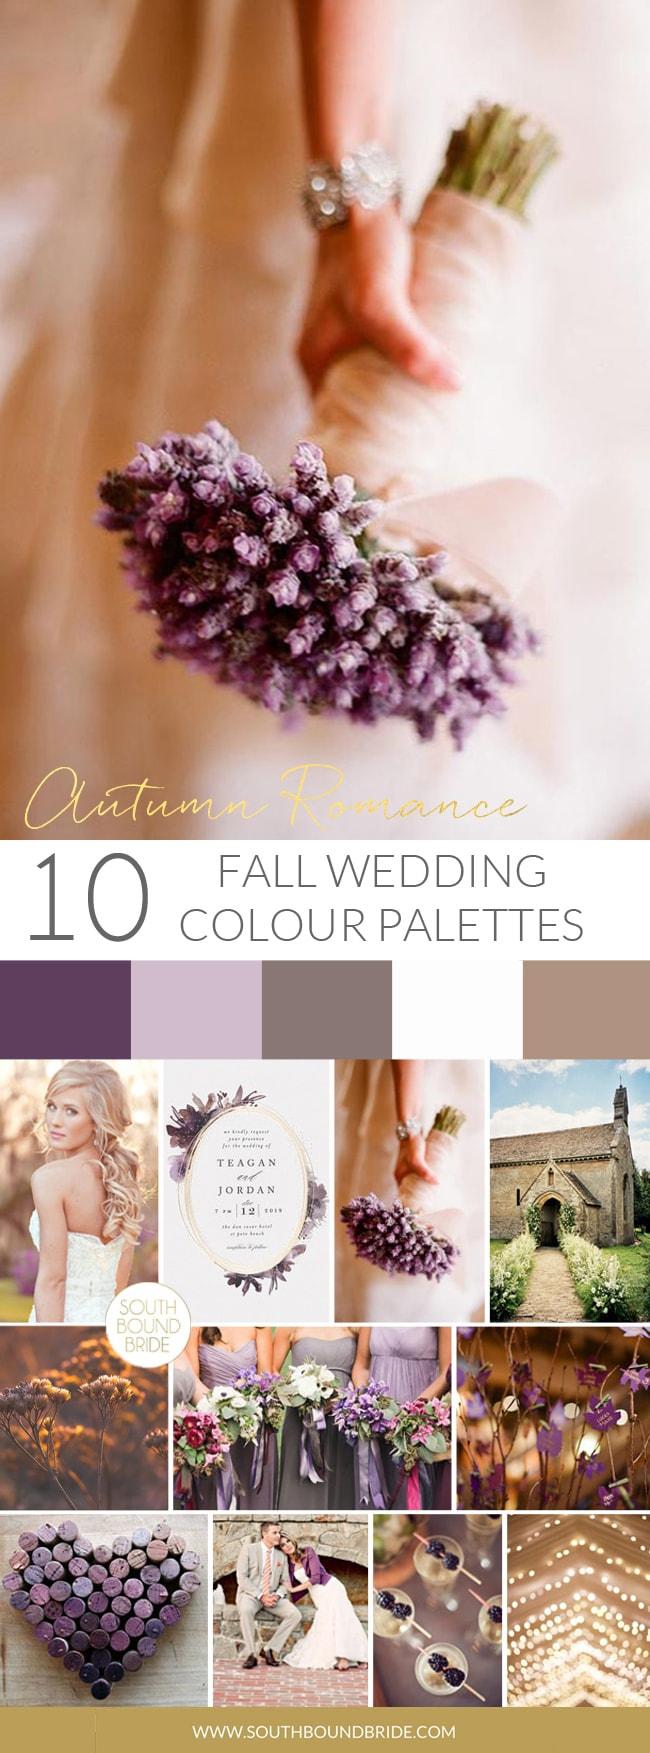 Autumn Romance Fall Wedding Palette | SouthBound Bride